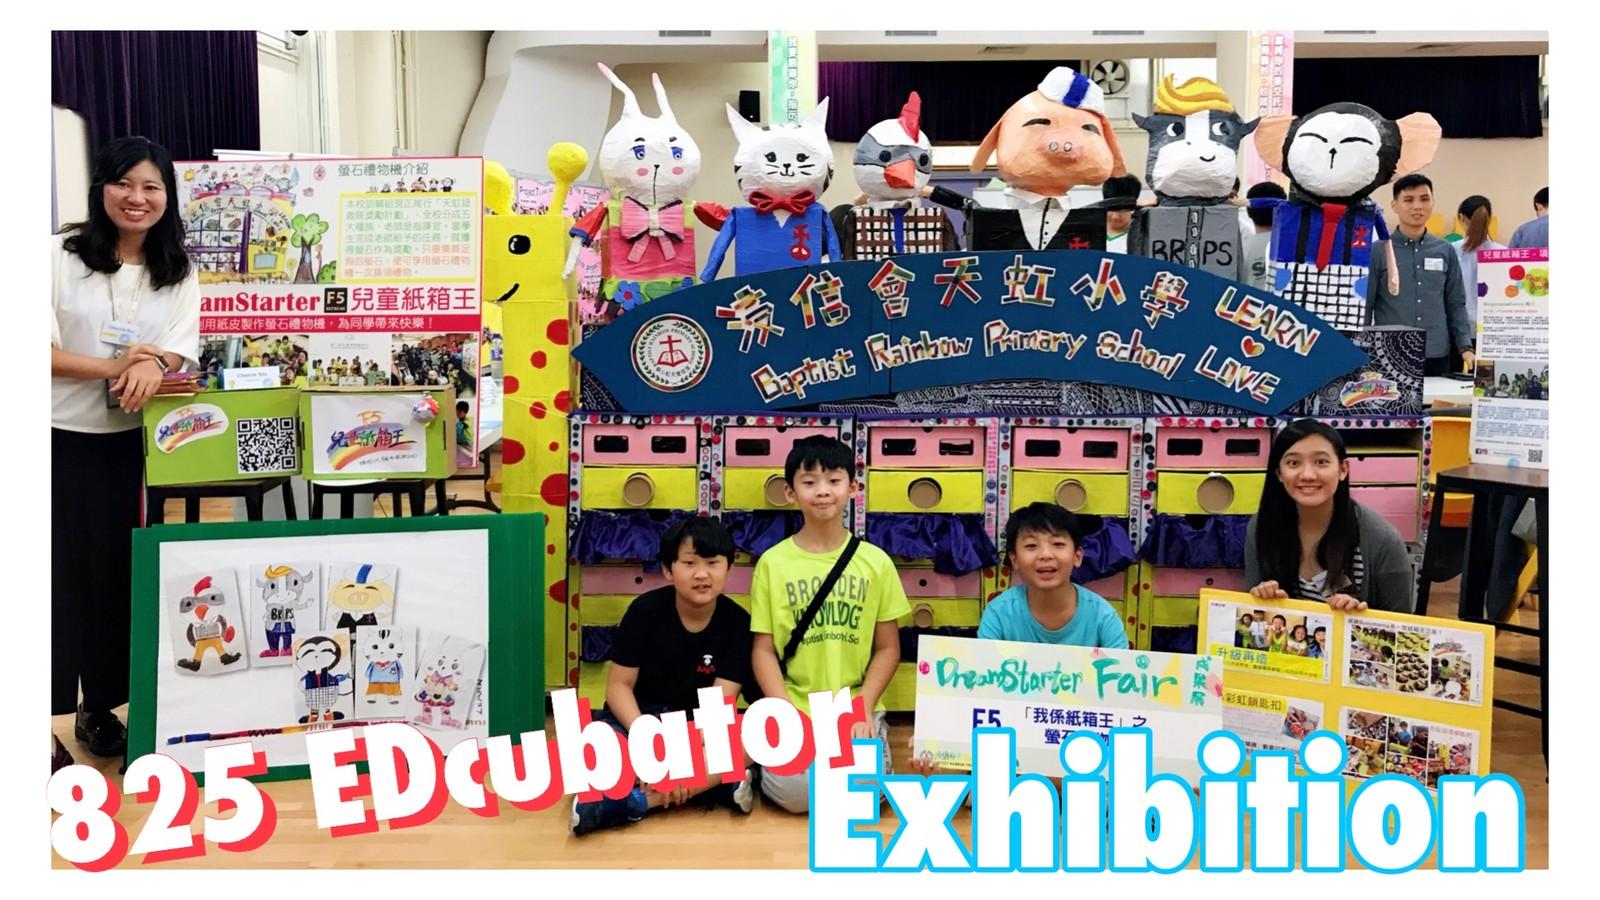 825 EDcubator Exhibition大成功!!